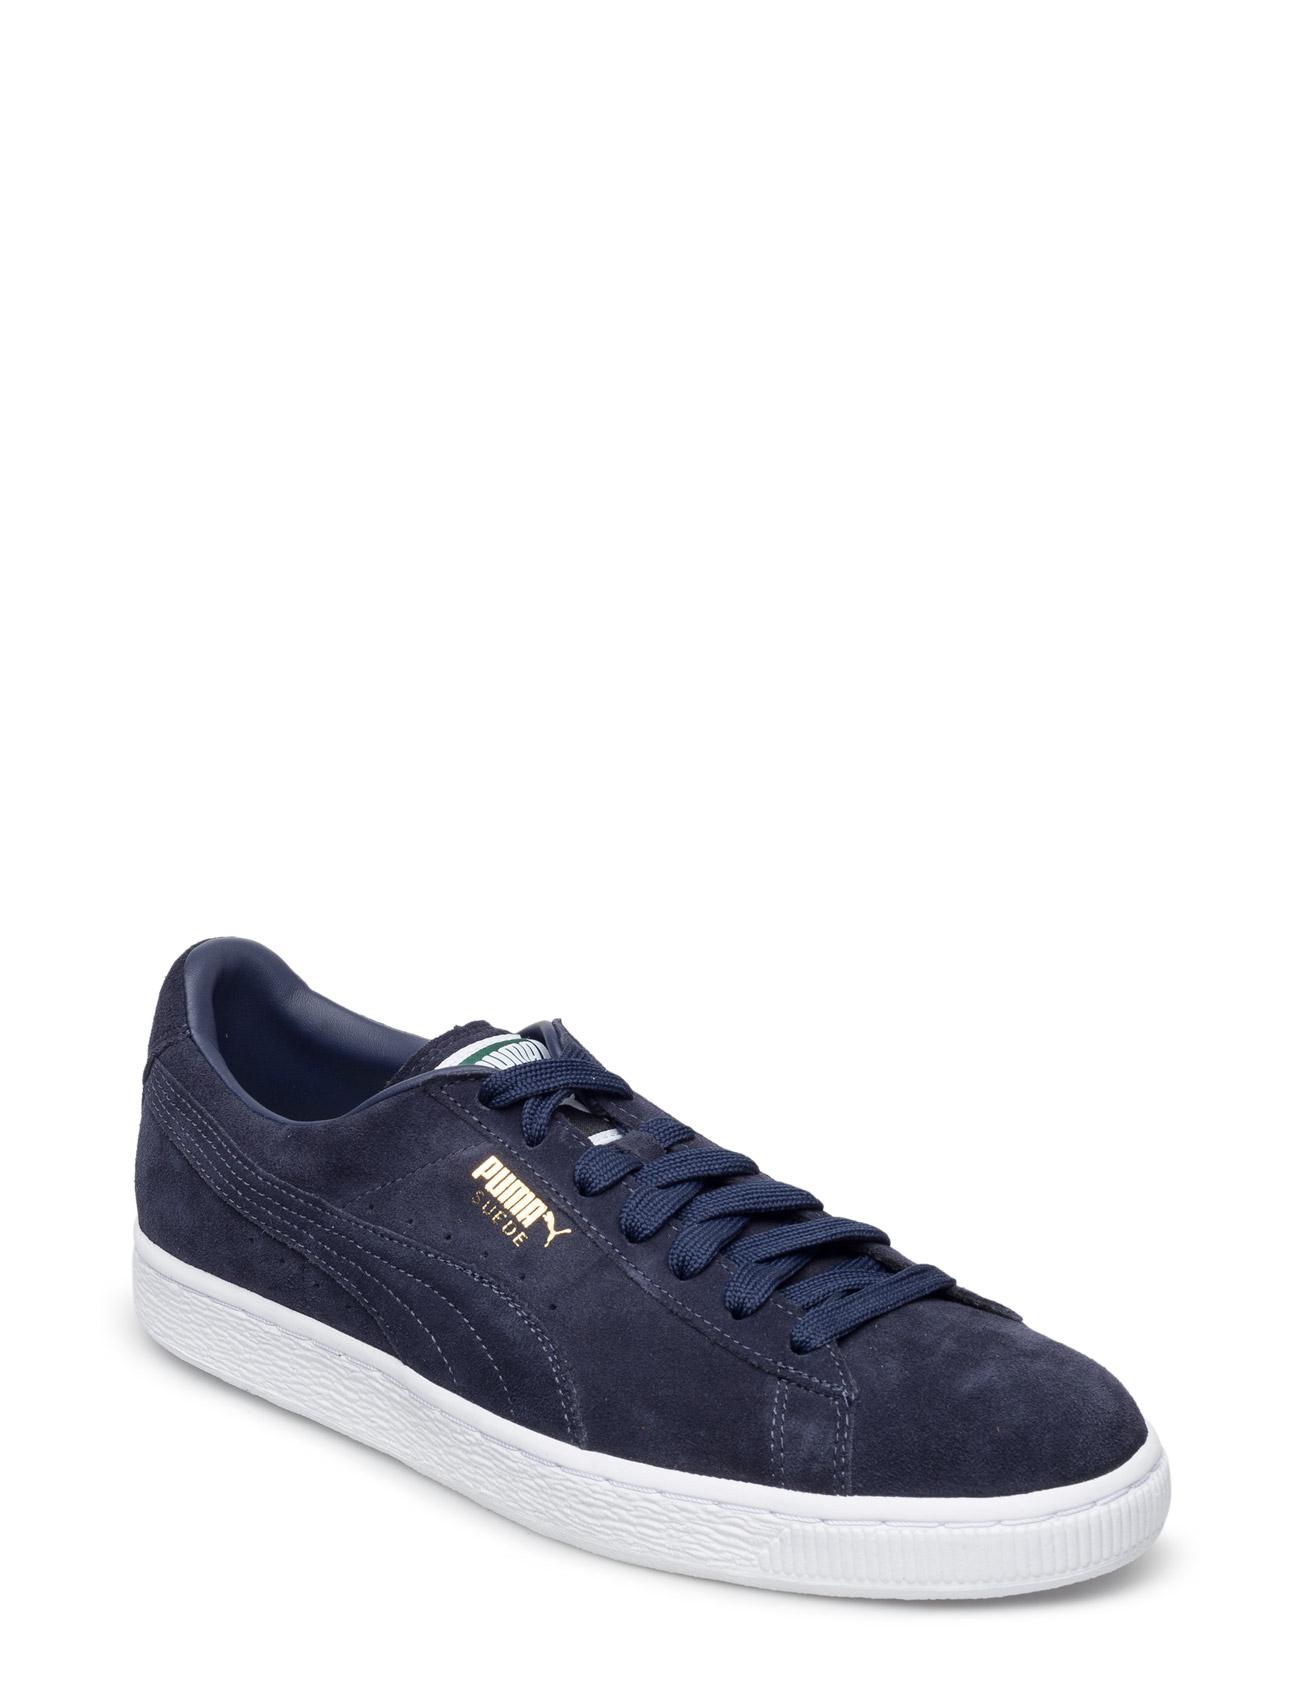 145b9c4a62f9 Suede Classic + (Peacoat-peacoat-white) (£79) - PUMA - Shoes